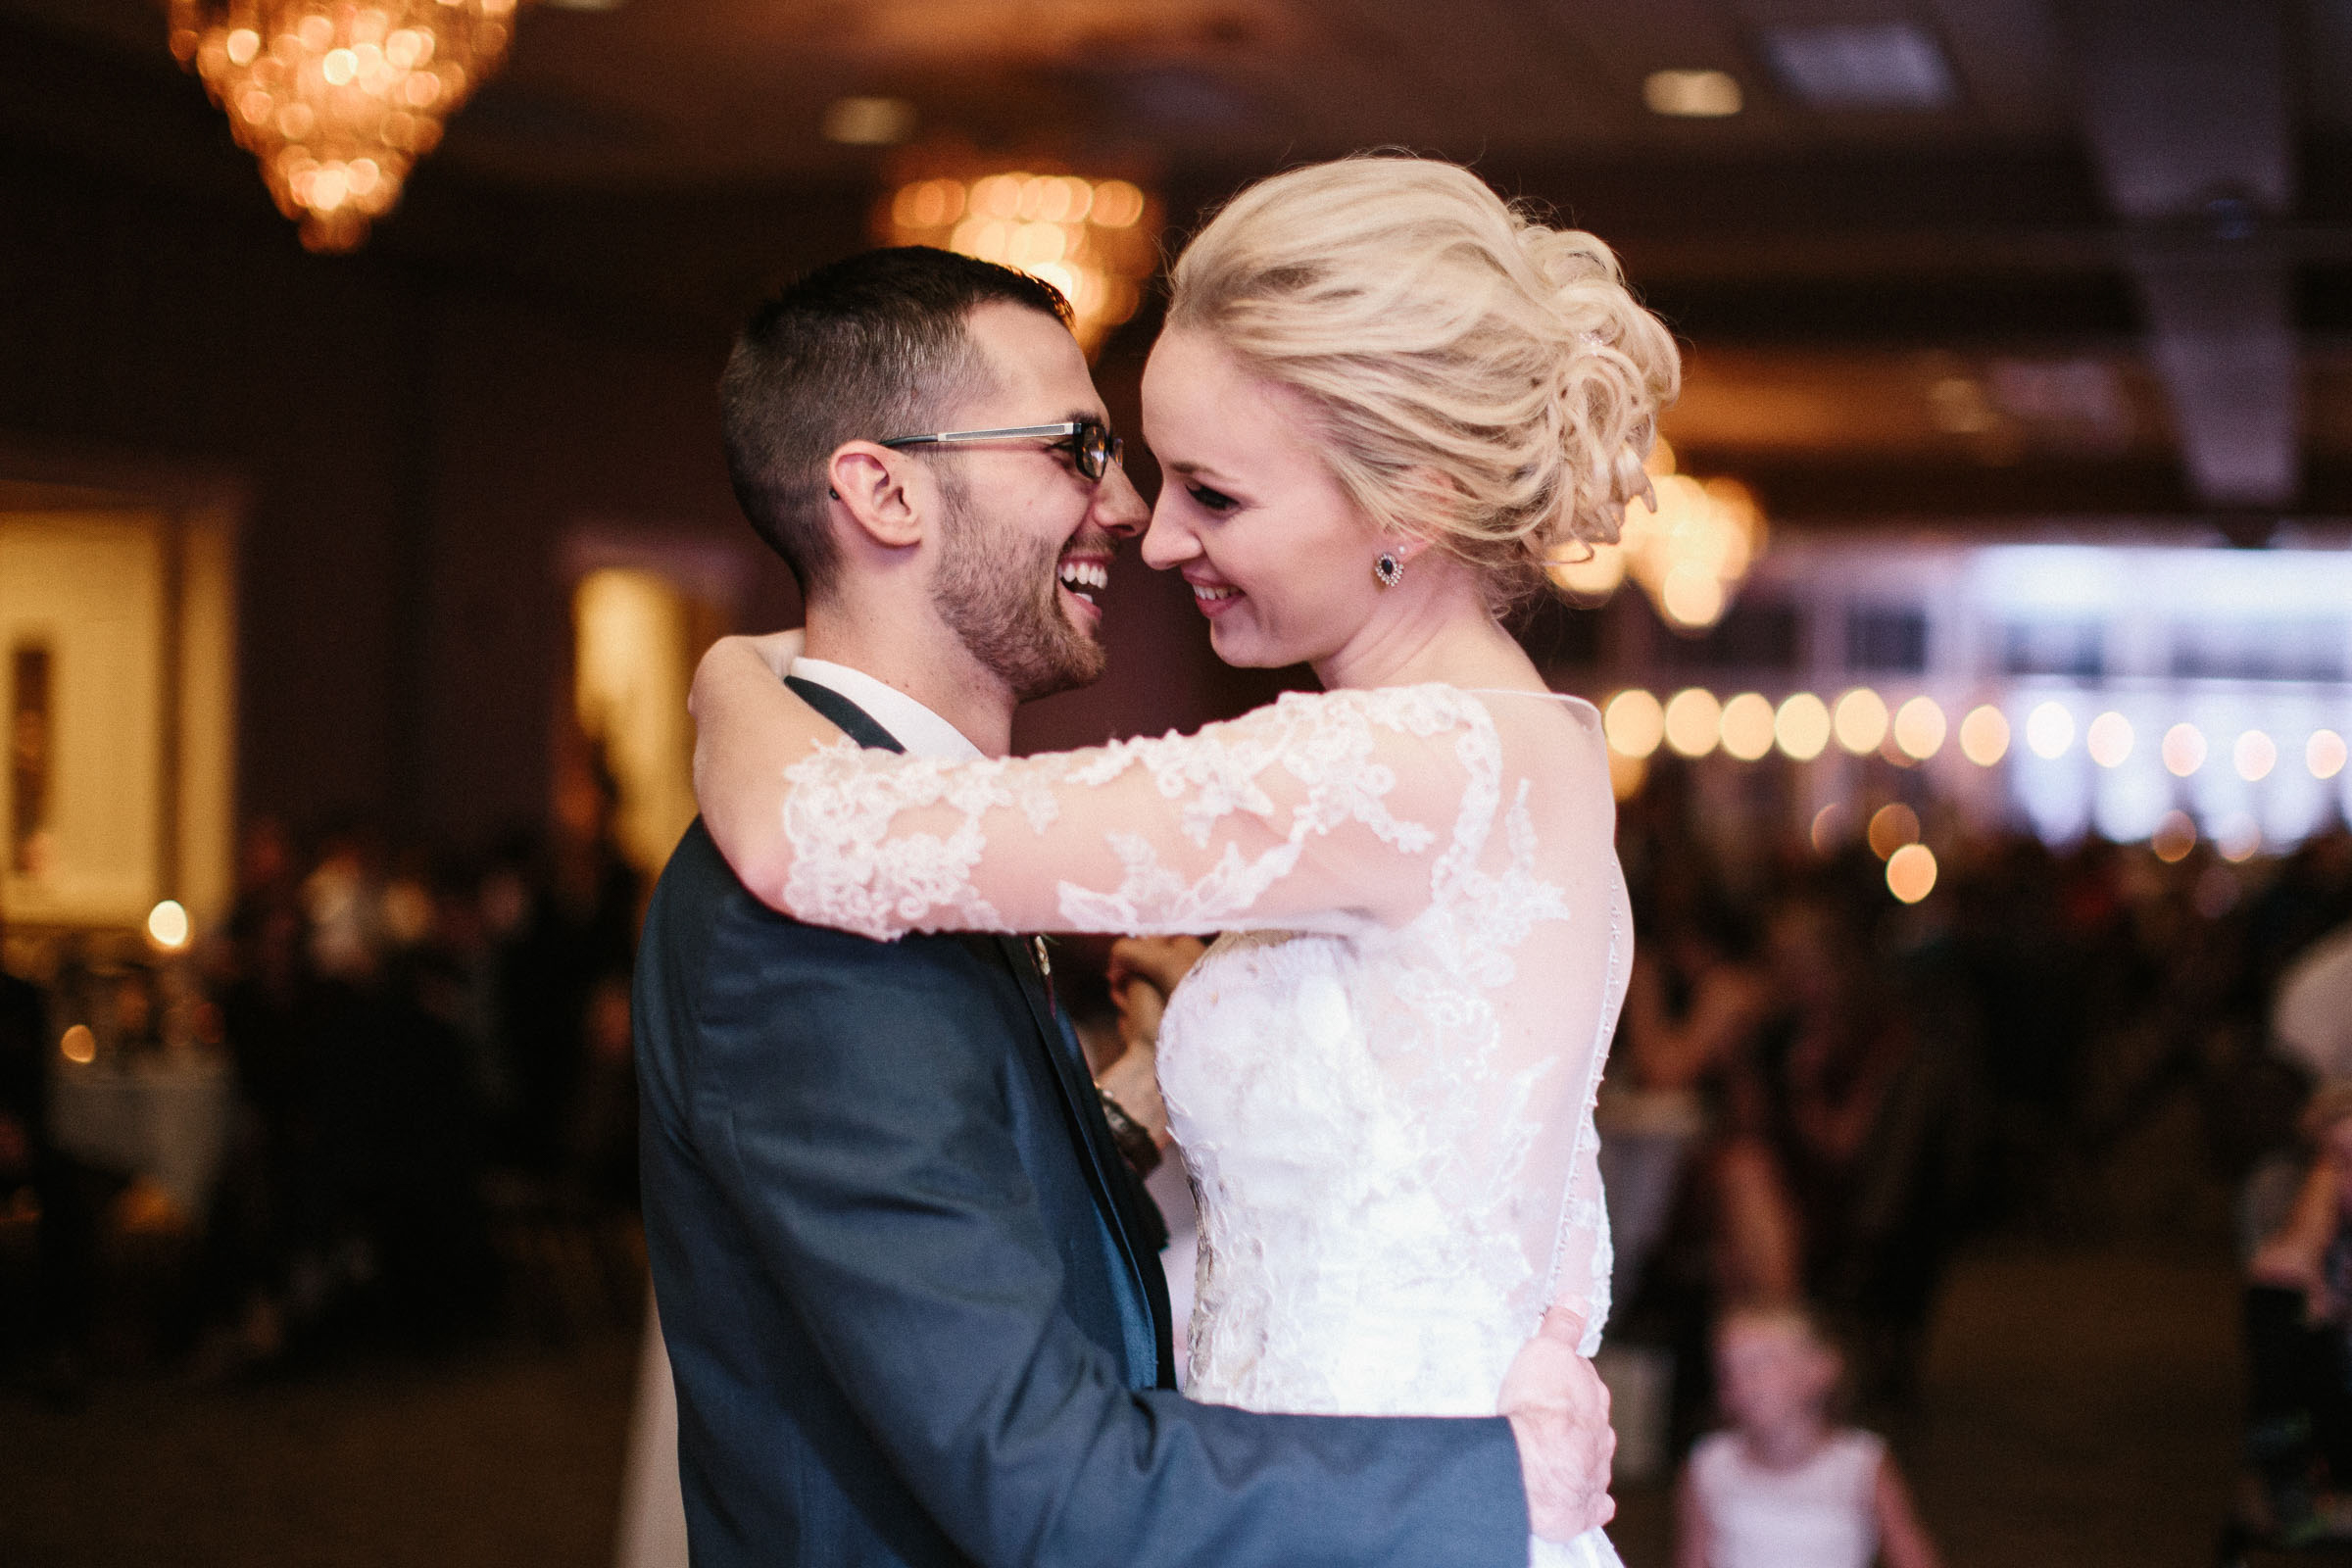 Jenna&Austin_SiouxFalls_Wedding_Photographer_106.jpg